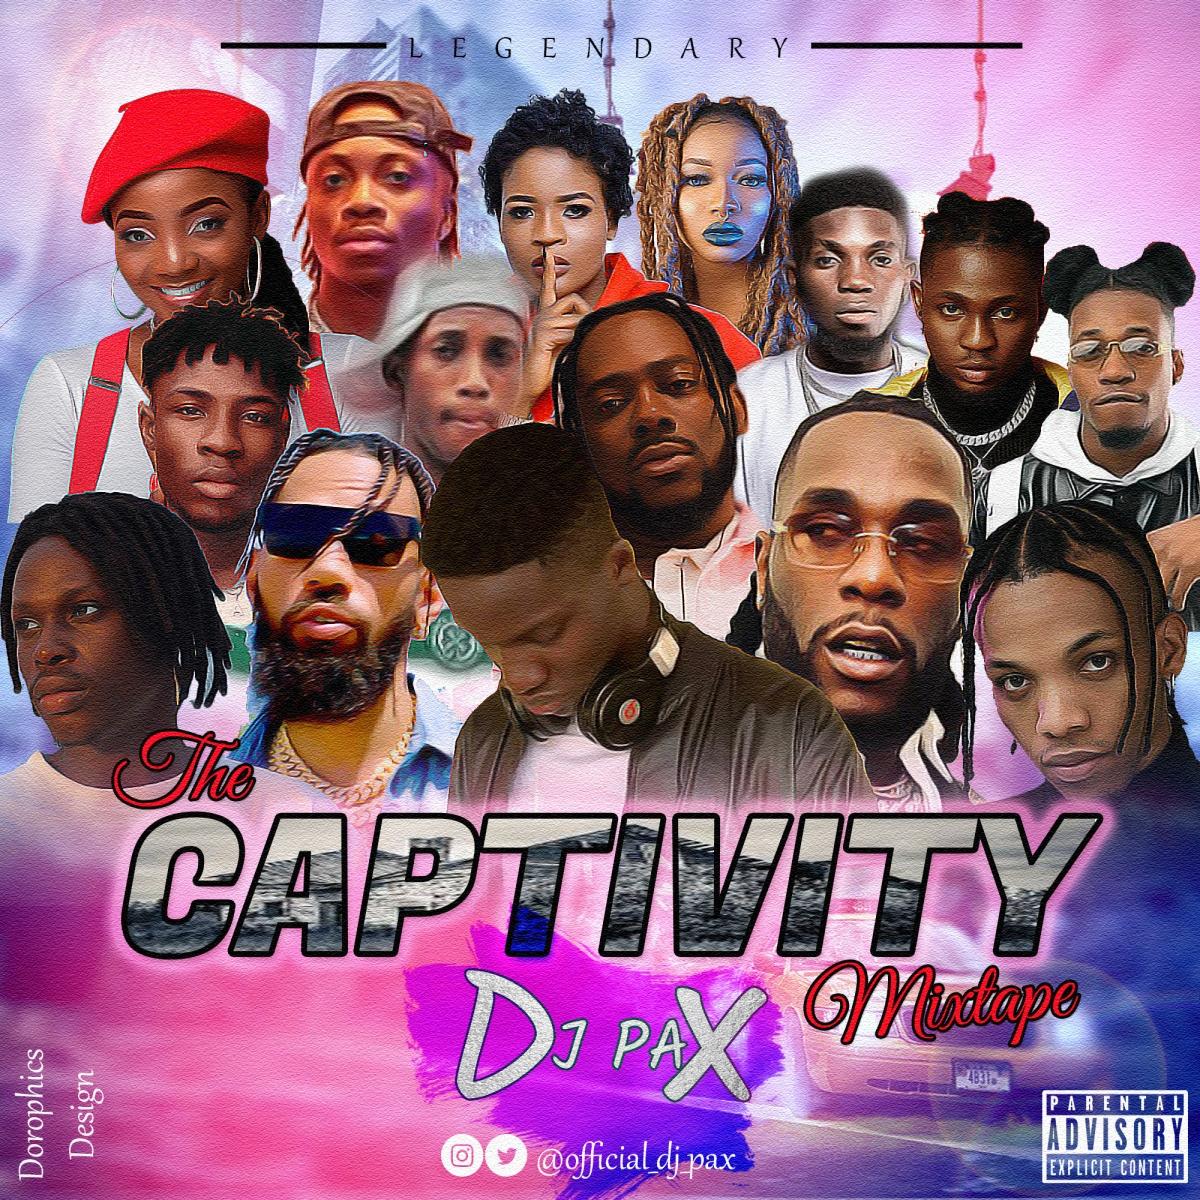 DJ PAX - The Captivity Mixtape